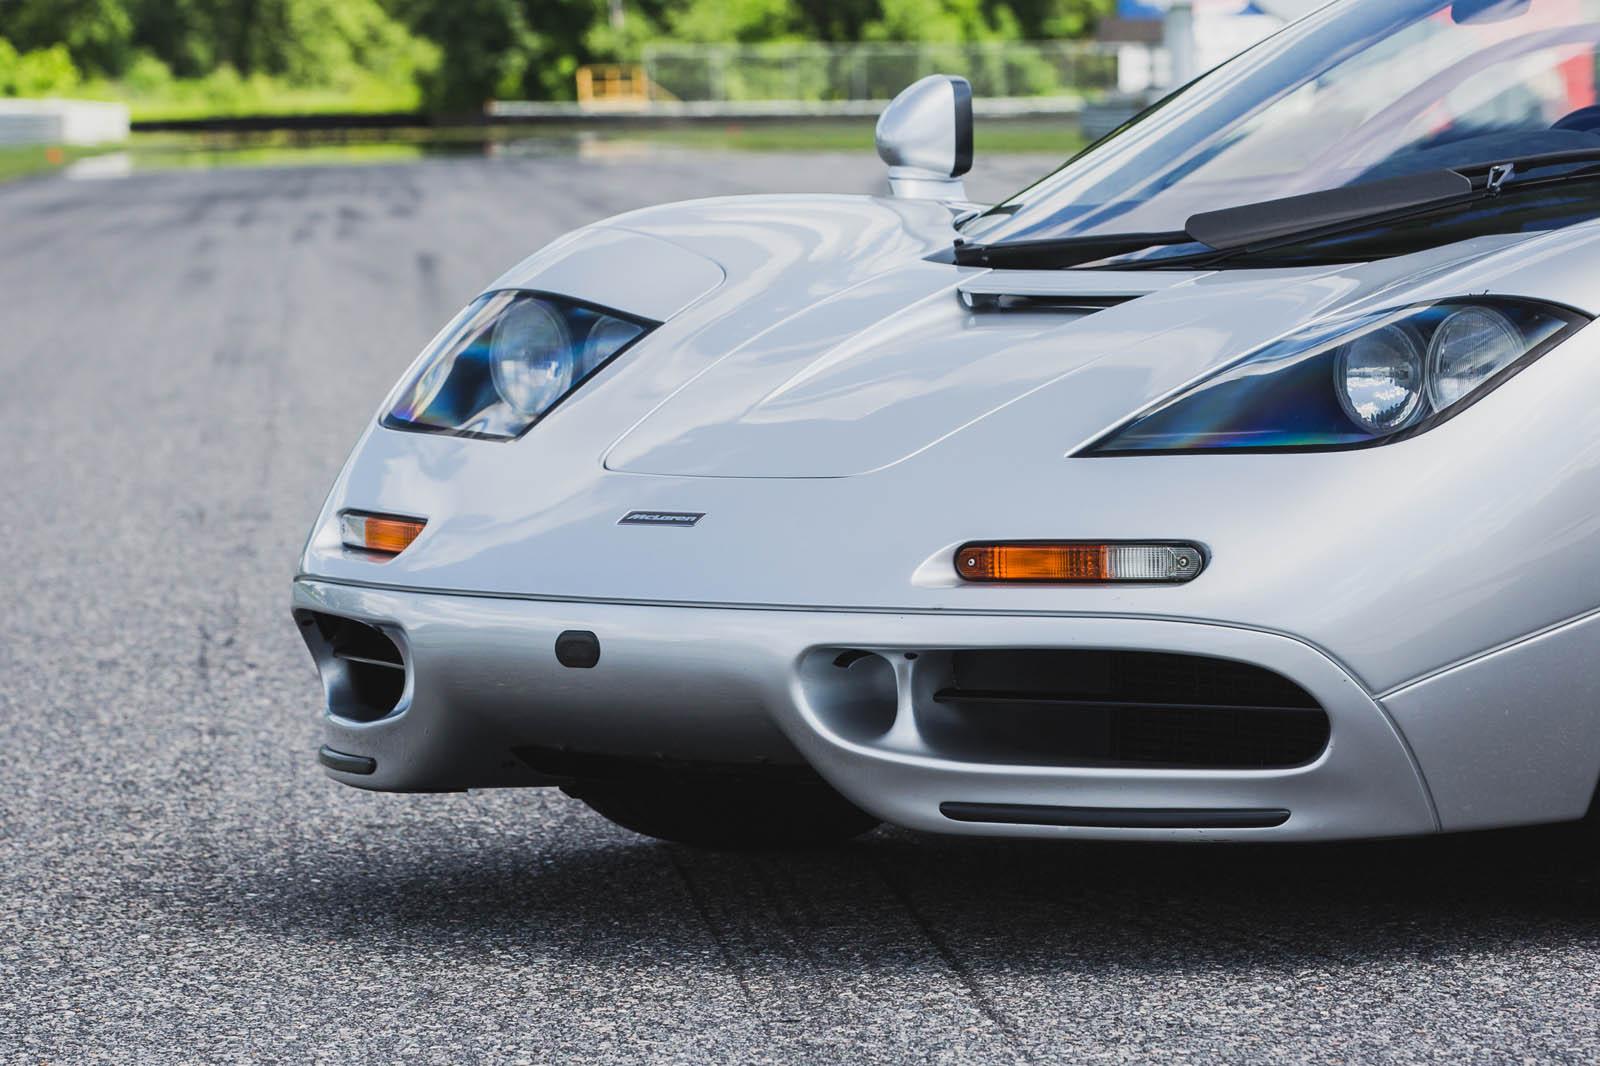 McLaren_F1-17 copy